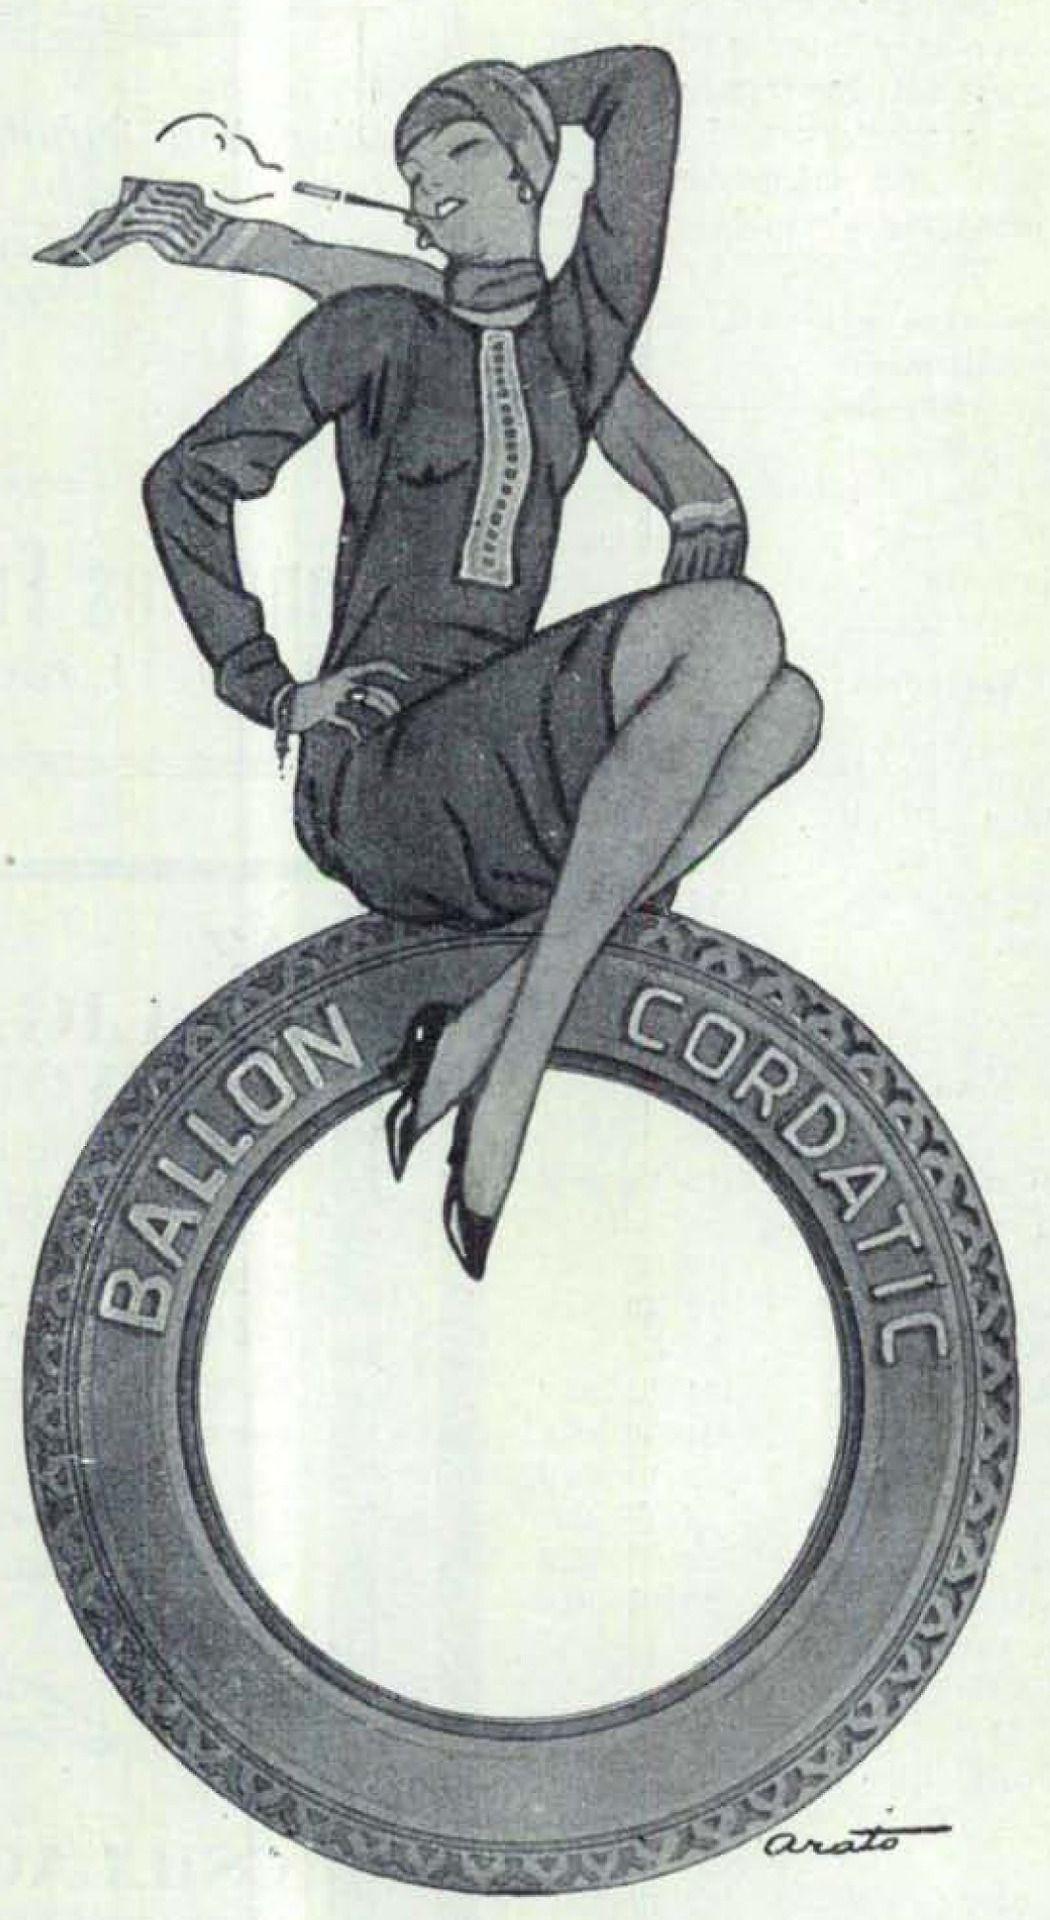 Cordiatic. In: Automobil motorsport 3. évf. 7-8. sz. (1928.)